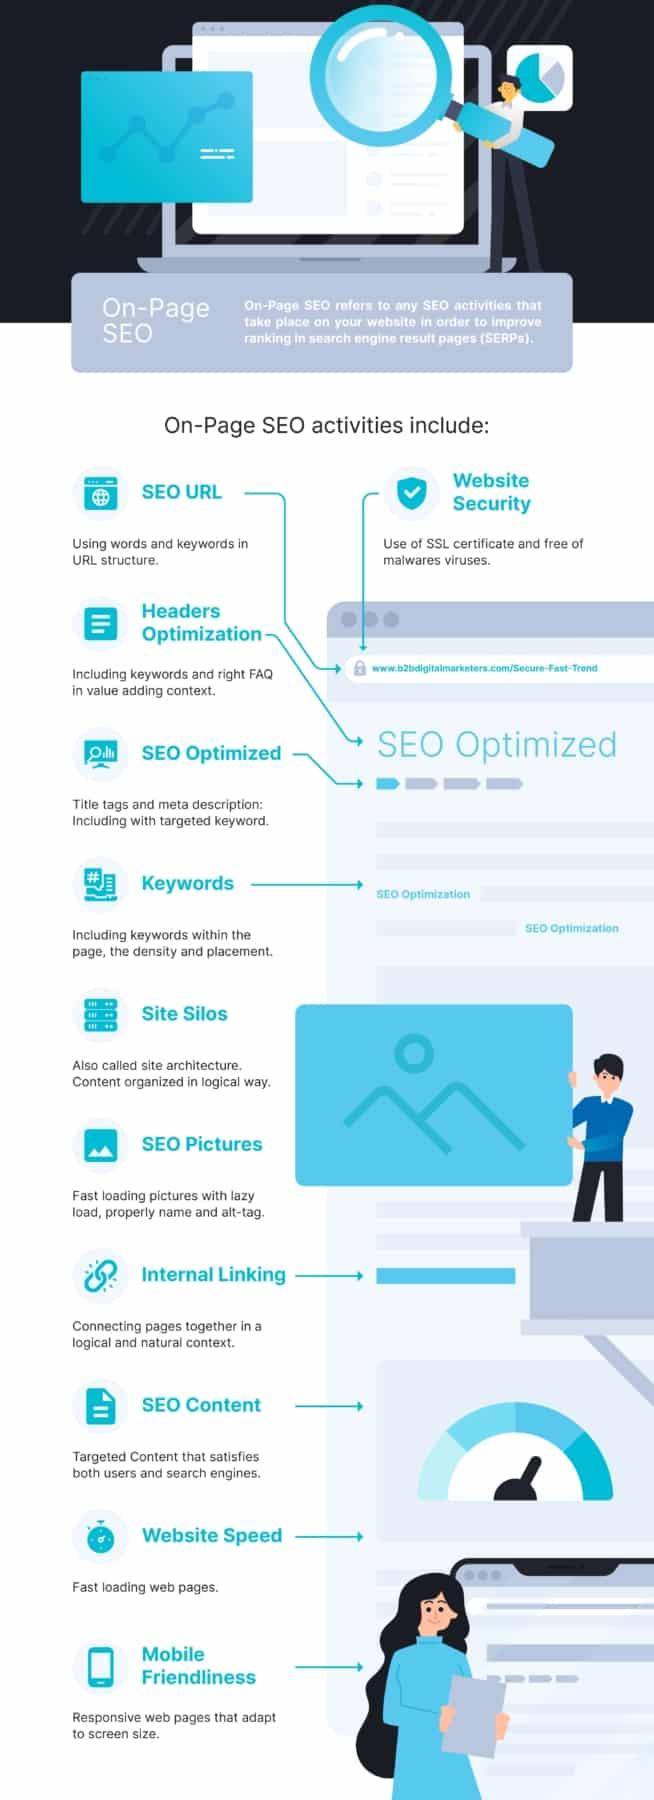 seo keywords on page seo optimization